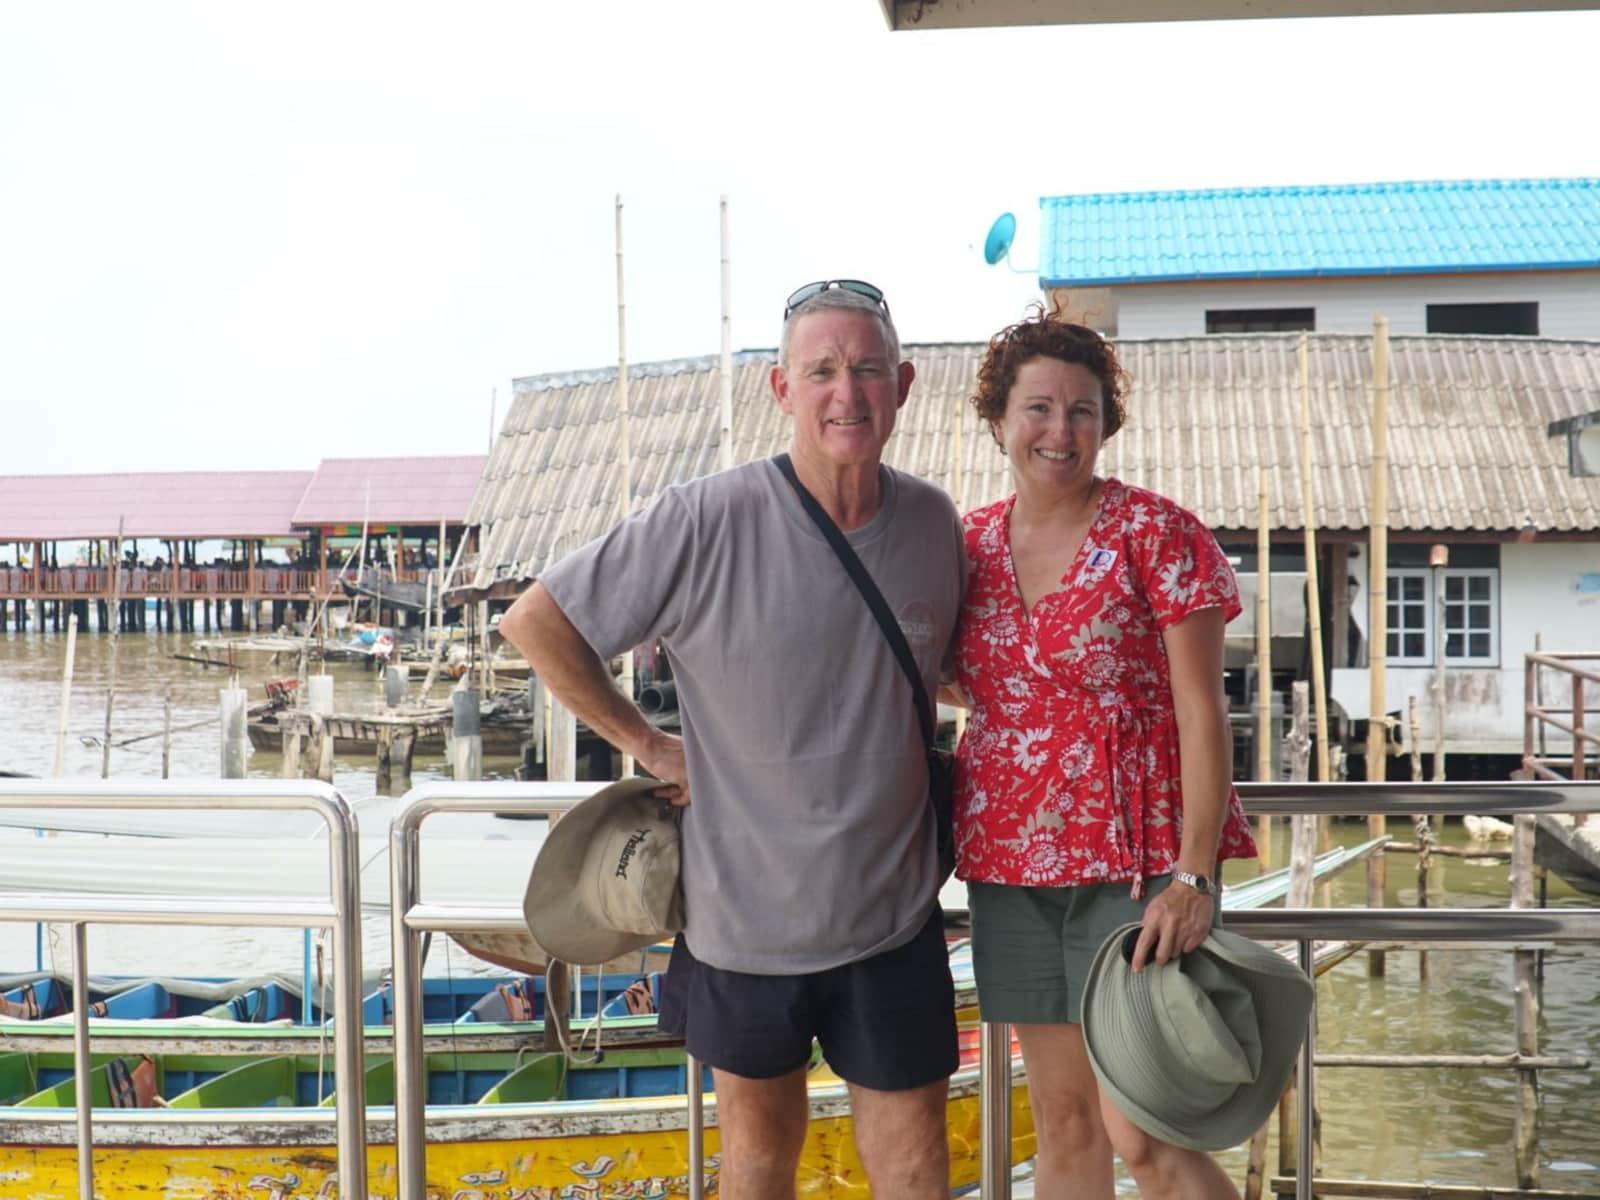 Barbara & Steve from Northam, Western Australia, Australia